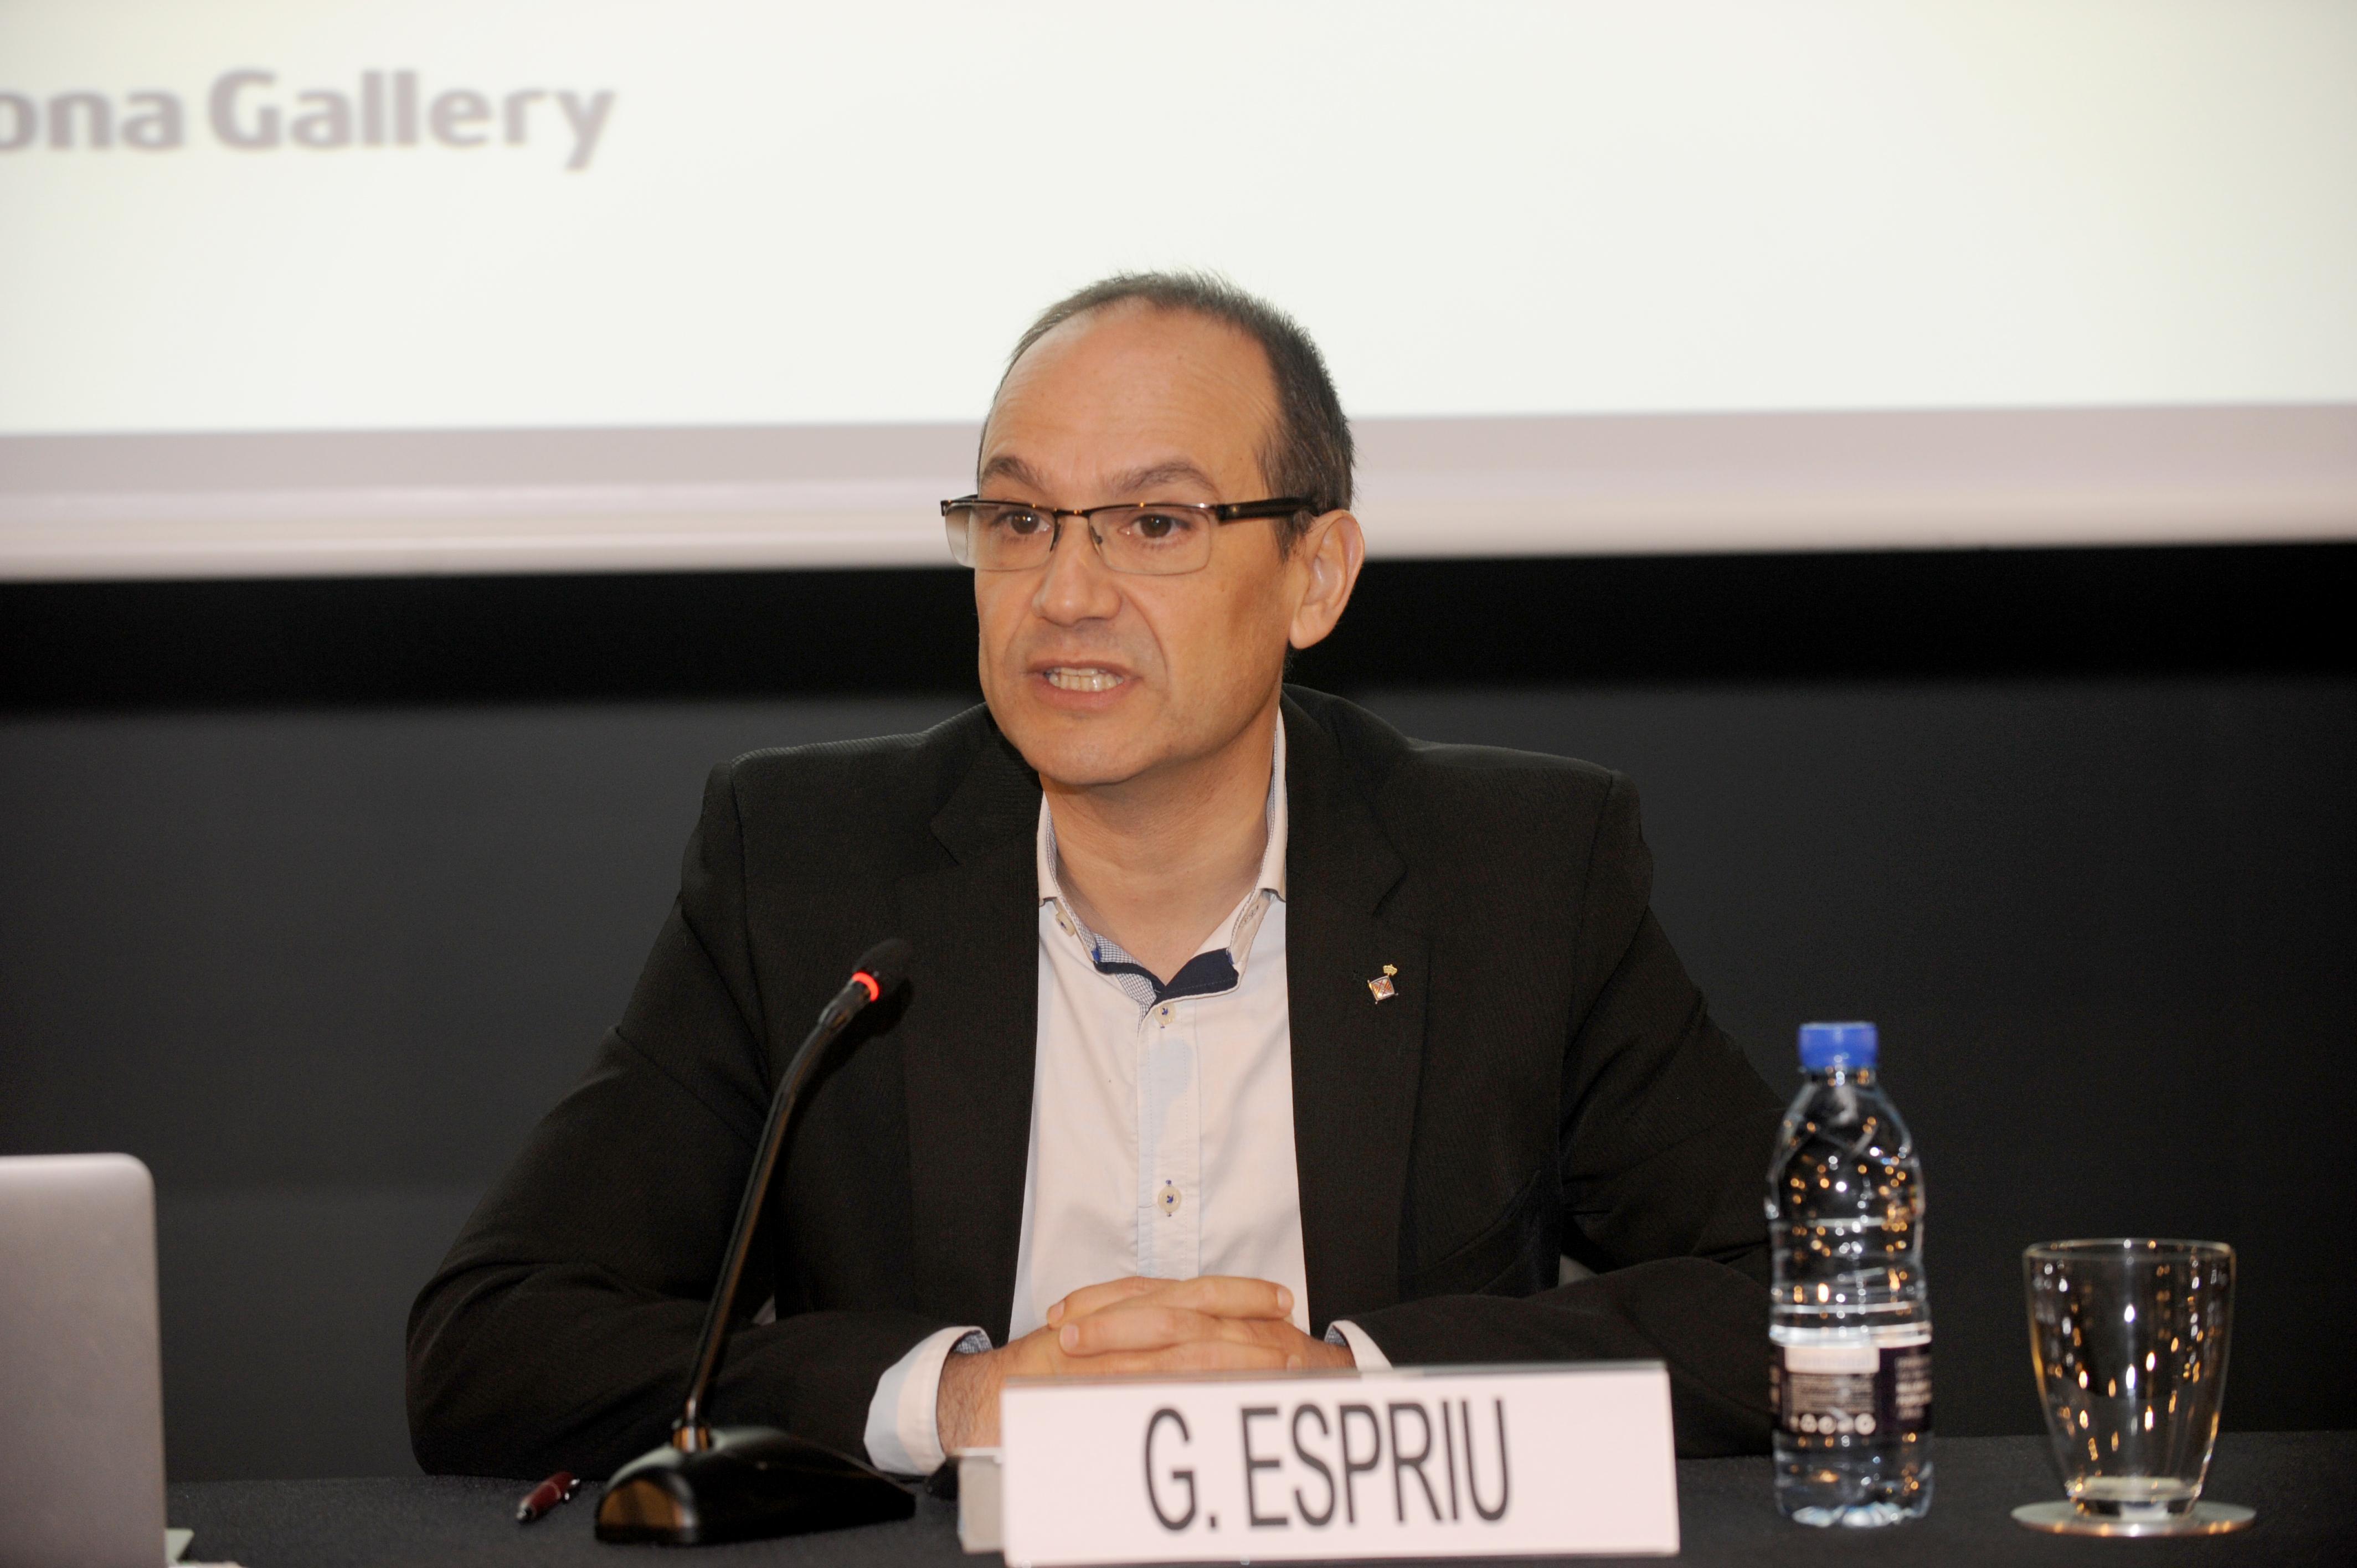 Guillem Espriu